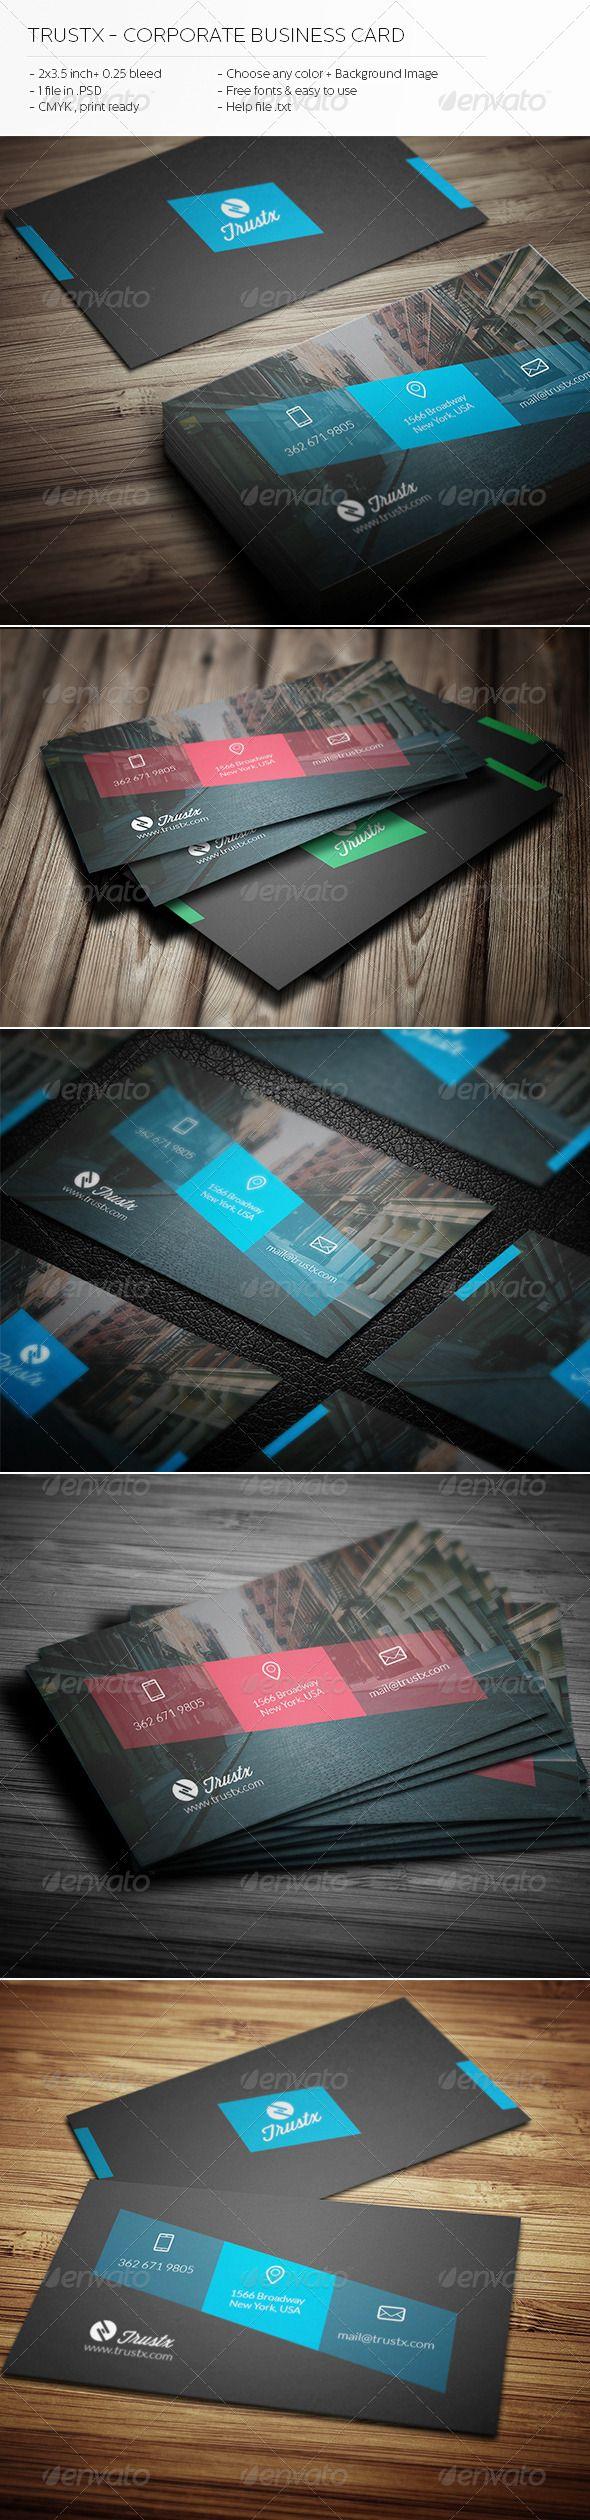 Best 18 business cards ideas on pinterest business card design trustx corporate business card httpgraphicriveritemtrustx solutioingenieria Gallery